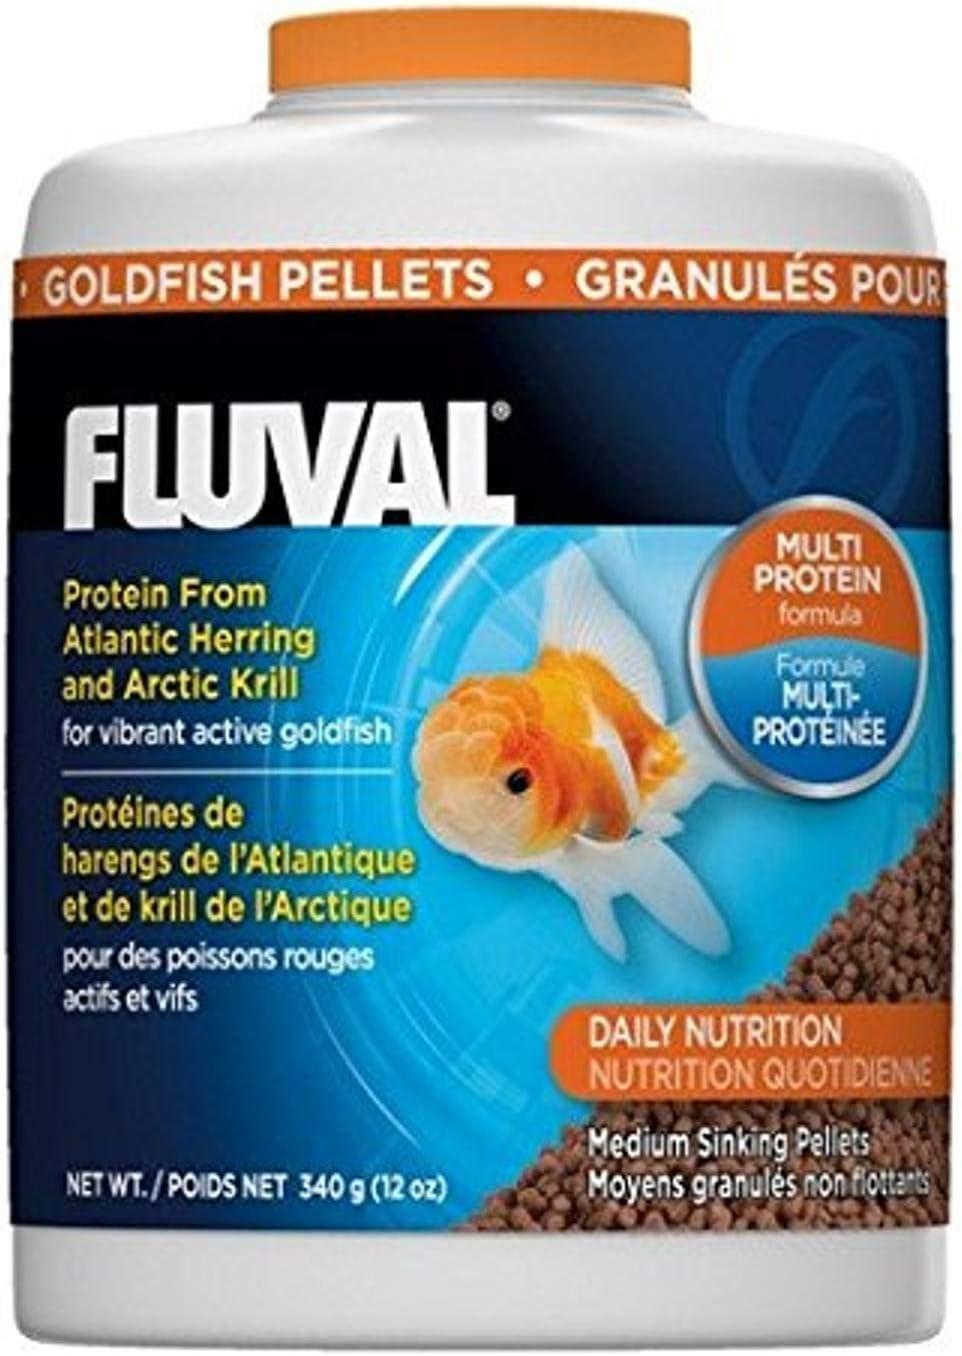 Fluval Goldfish Pellets, Goldfish Food for Vibrant Active Fish